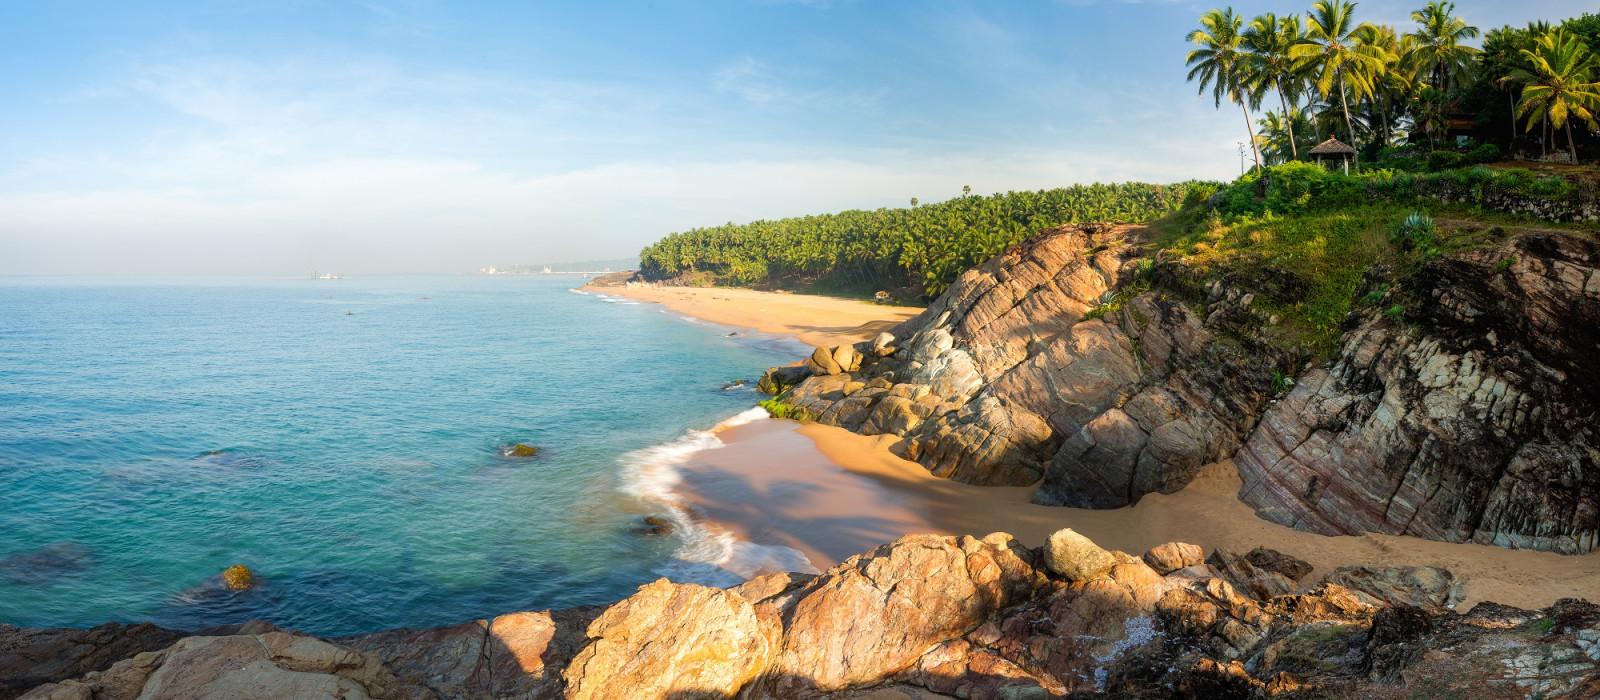 Südindien-Reise: Tempel, Tigersafari & Strand Urlaub 1